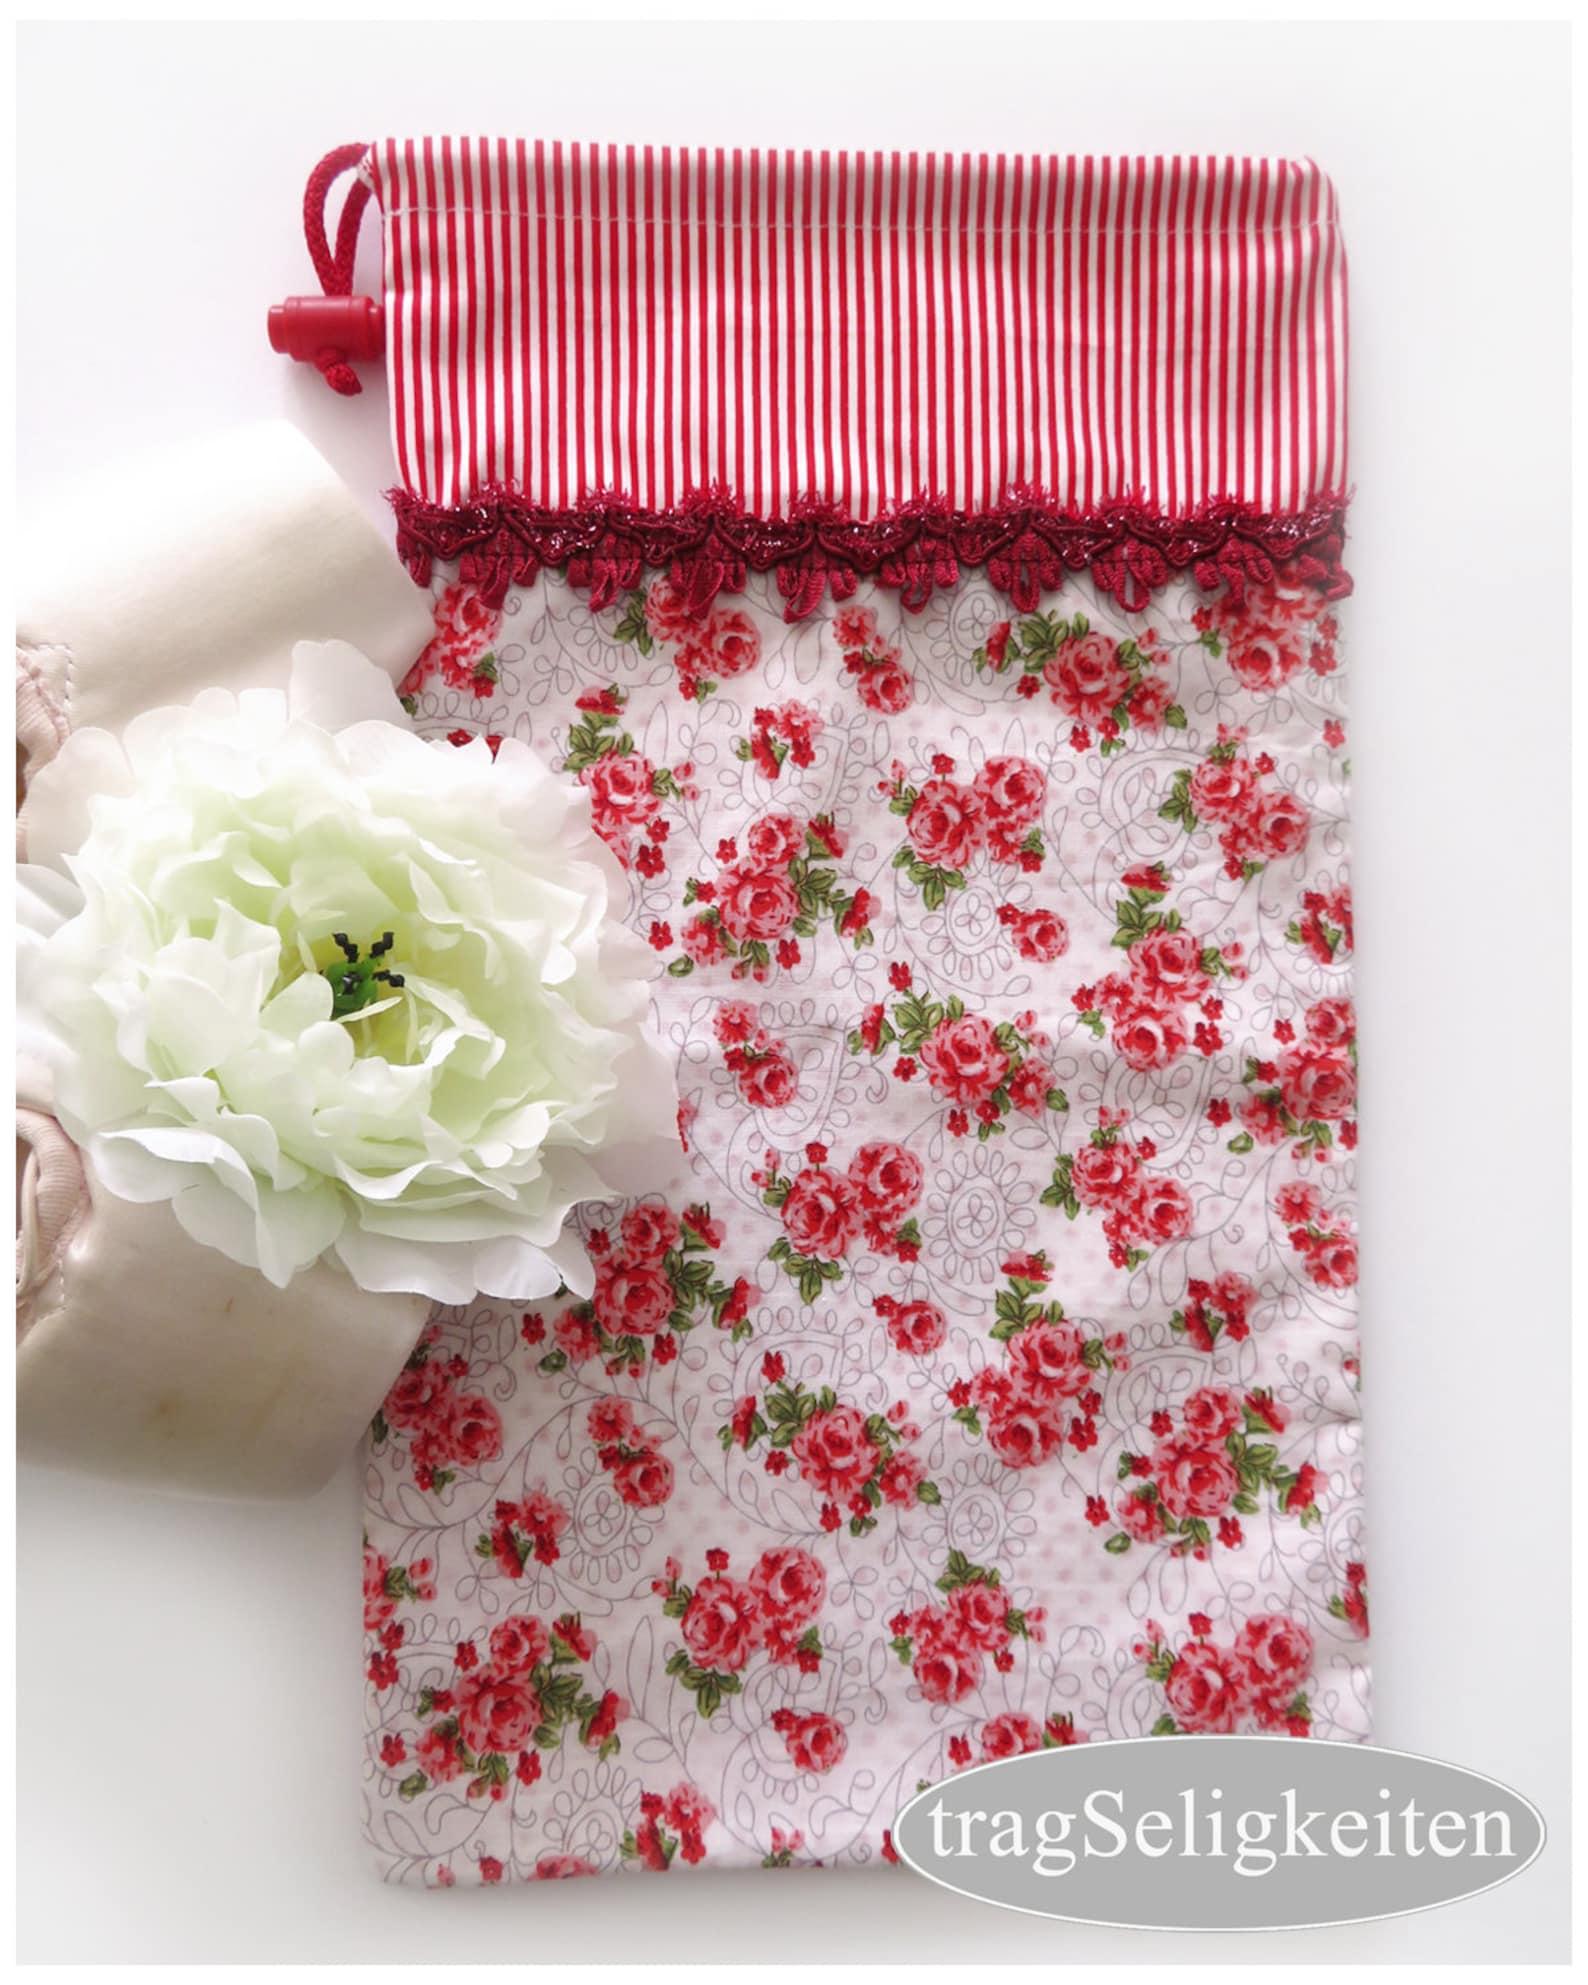 red white pointe shoe bag, ballet shoe bag, rose print, mesh back, dance shoe bag, drawstring bag, ballet bag, dance gift, balle